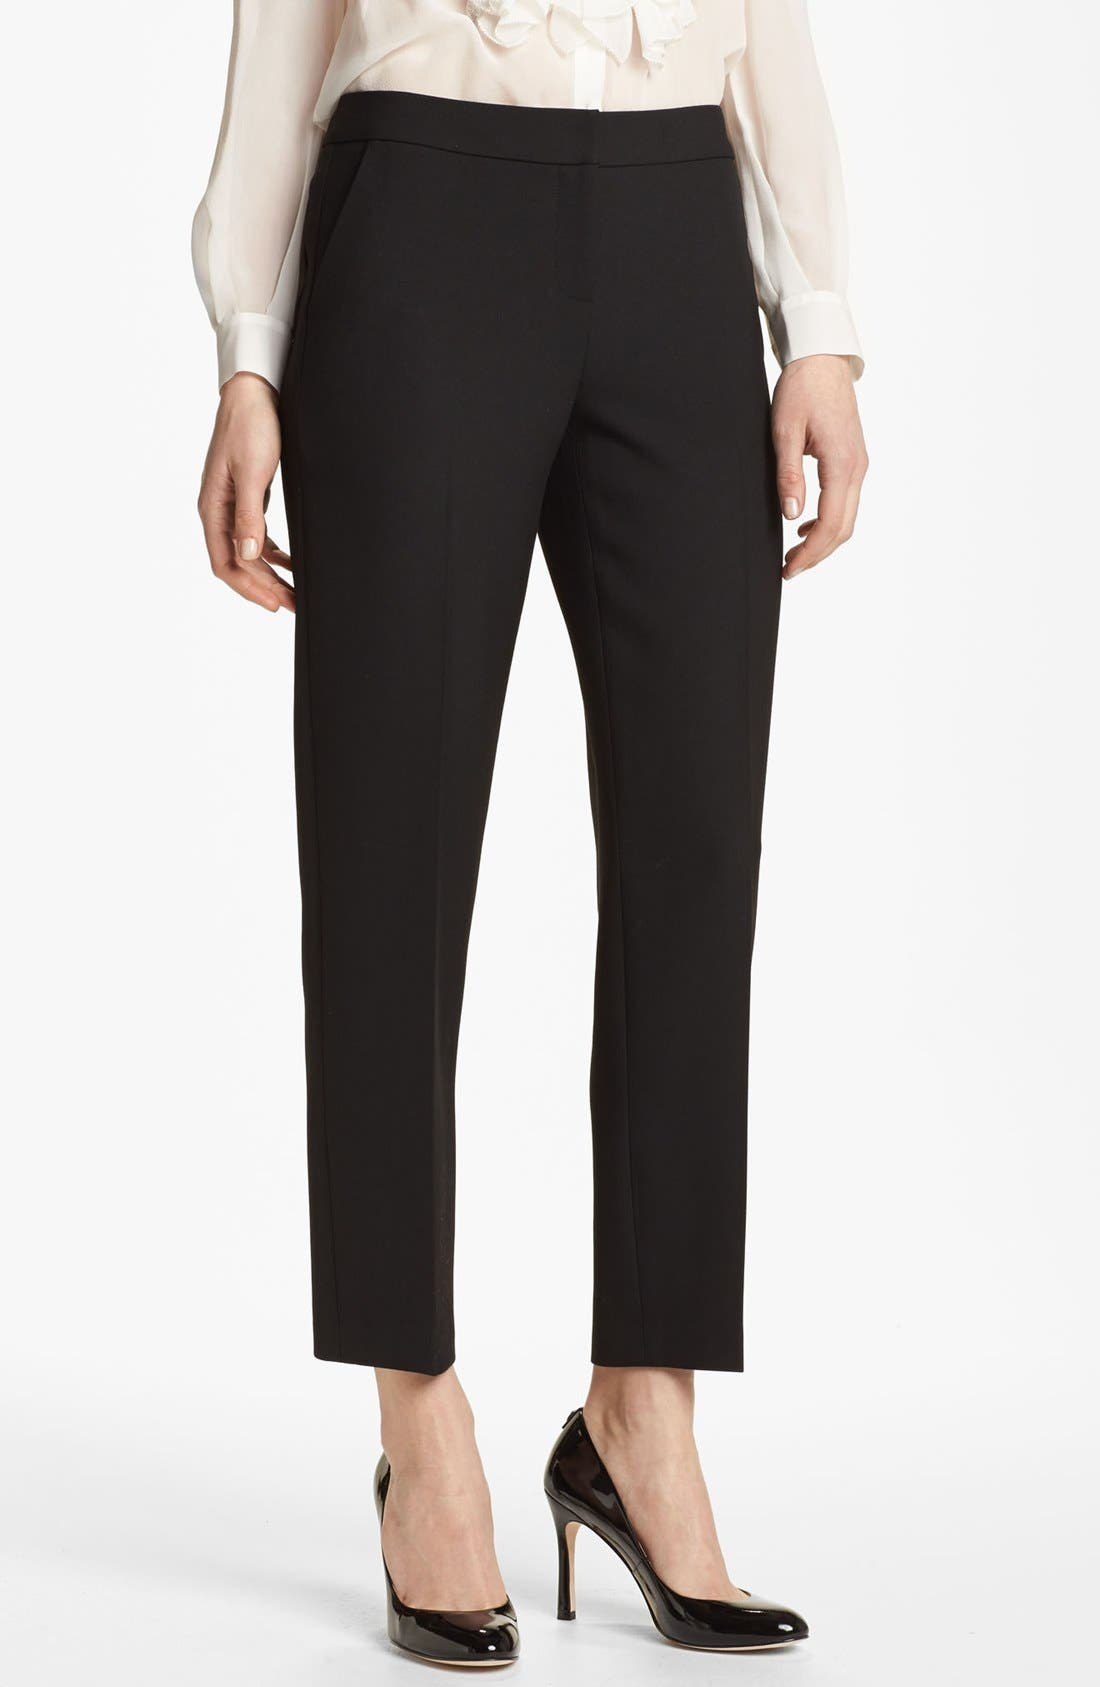 Alternate Image 1 Selected - Classiques Entier® 'Notion Weave' Slim Ankle Pants